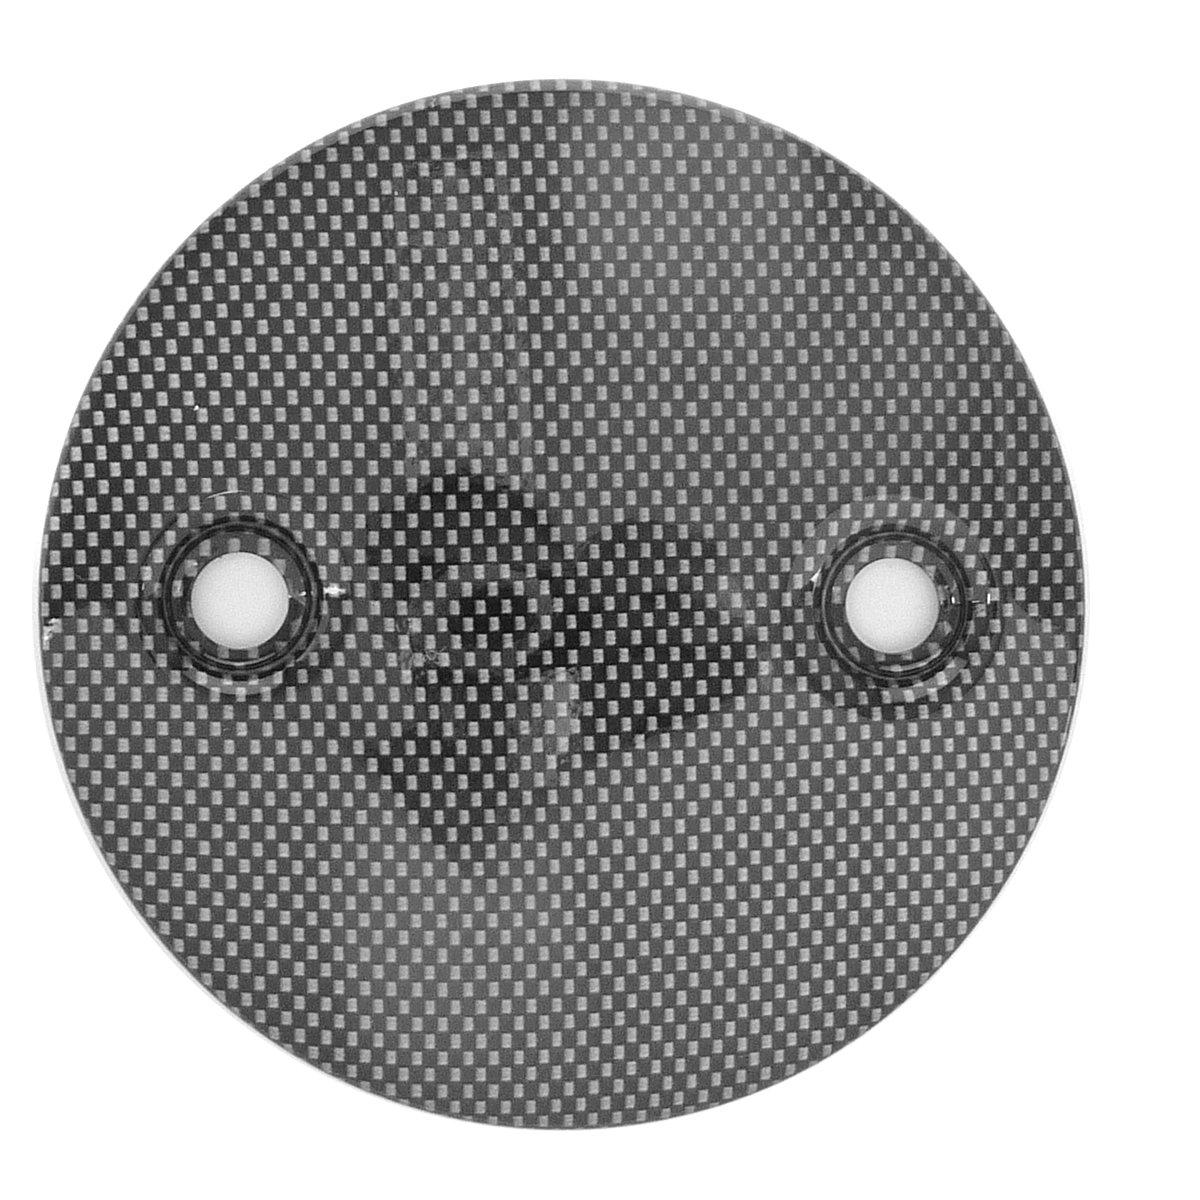 tnttu 368000 M protettiva Cover dimmer Adattatore Yamaha Tmax 500 Carbonio, SACIM Distribution 368000M